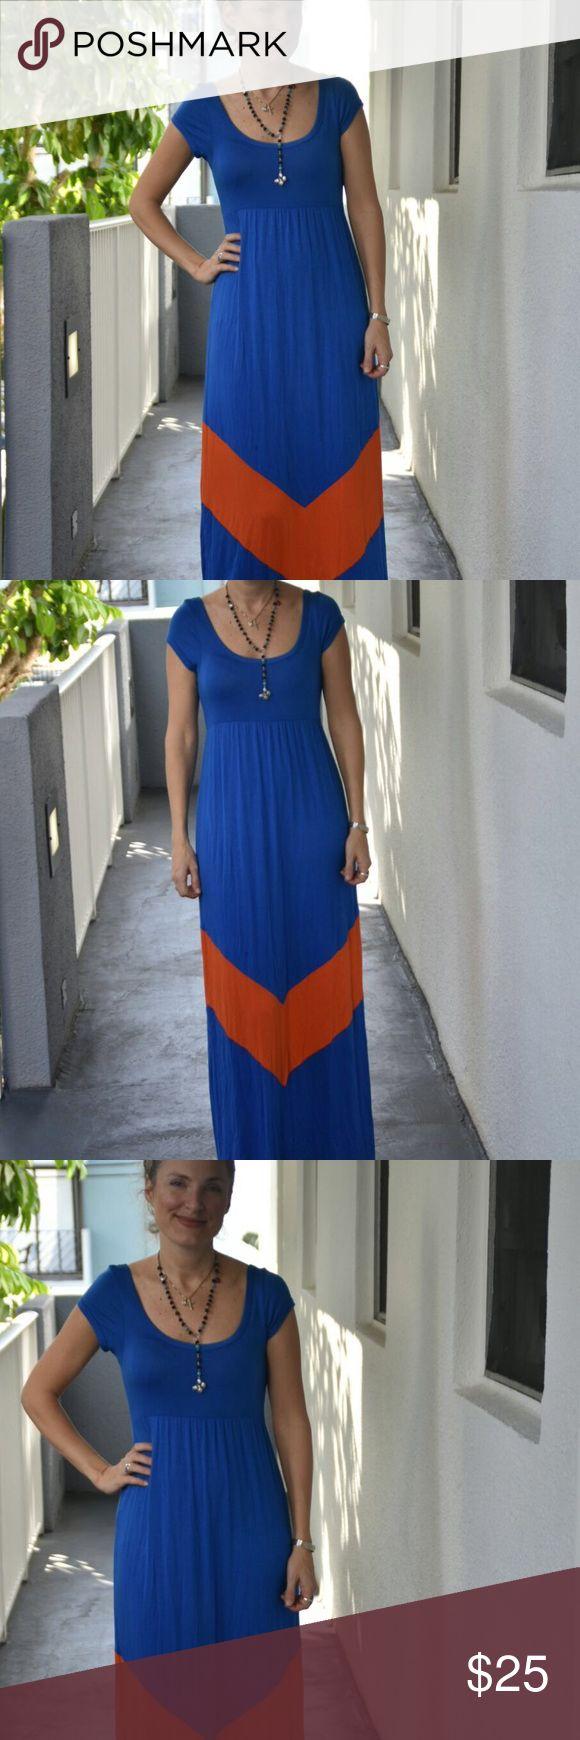 Gabriella Rocha maxi dress in size medium 🌶🌶🌶 Gorgeous color combination in this Gabriella Rocha maxi dress in zone medium ; super comfy and in great conditions 🌶🌶🌶 Gabriella Rocha Dresses Maxi